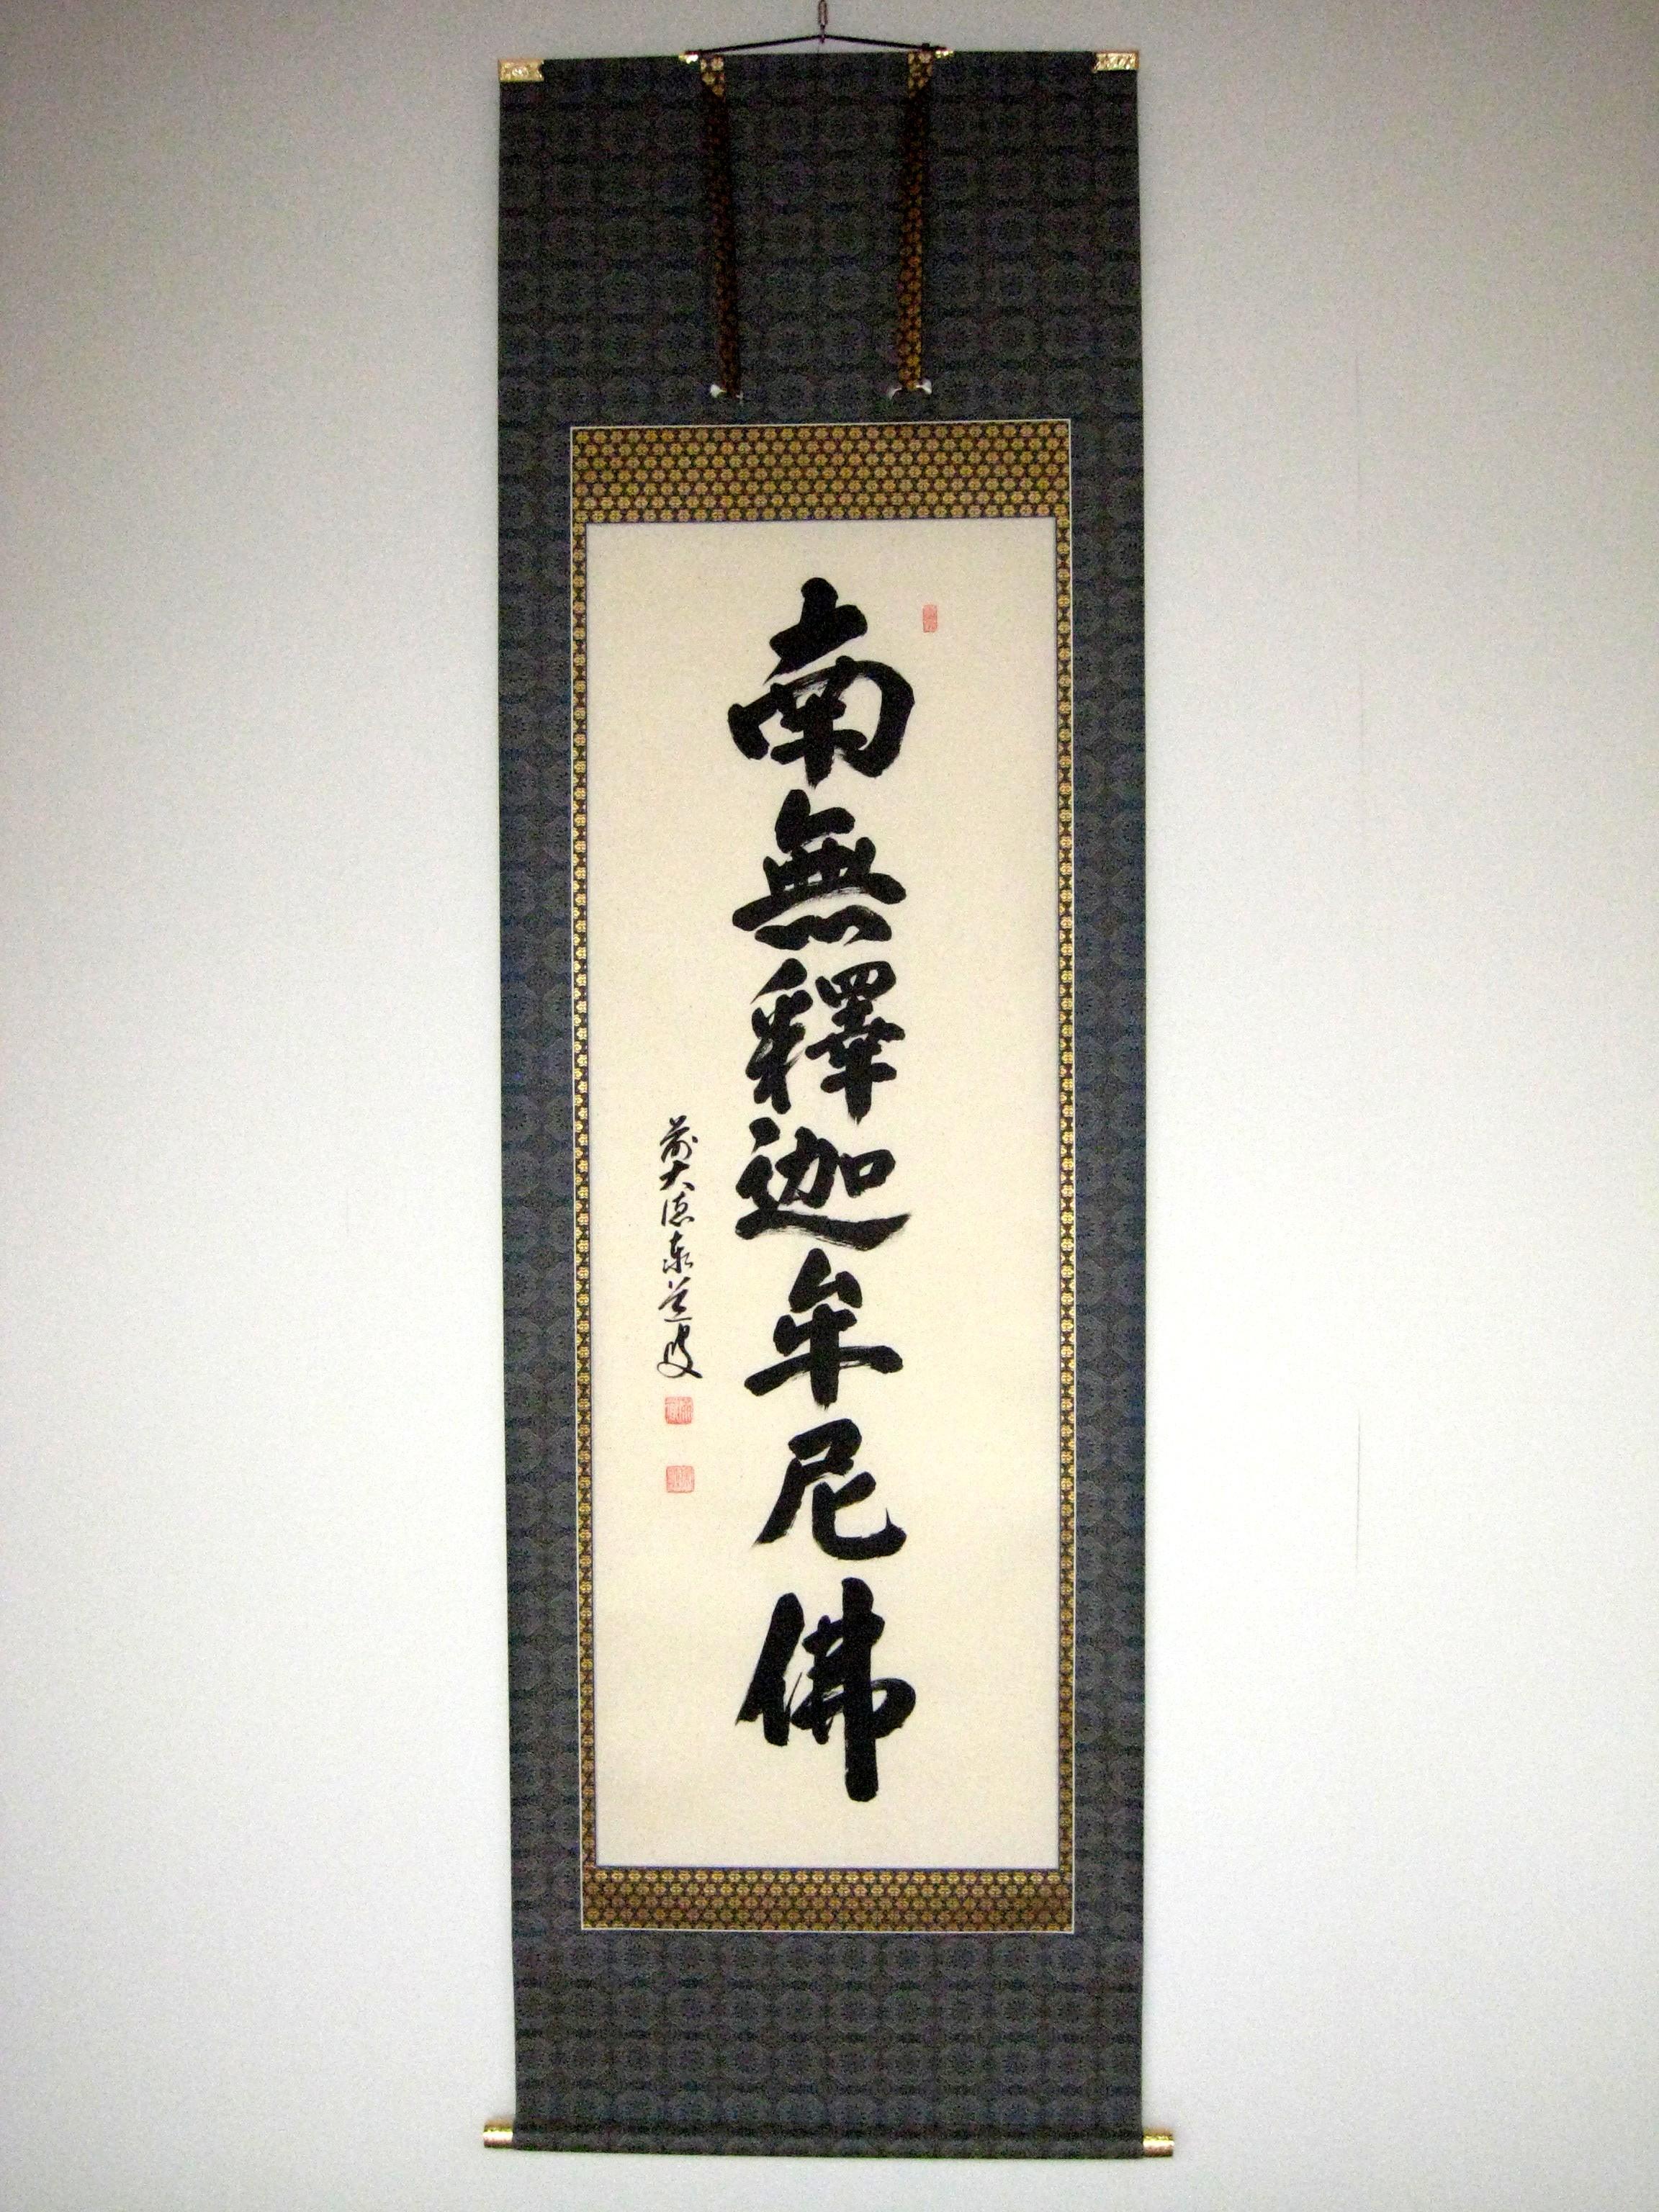 掛け軸 釈迦名号◆足立泰道